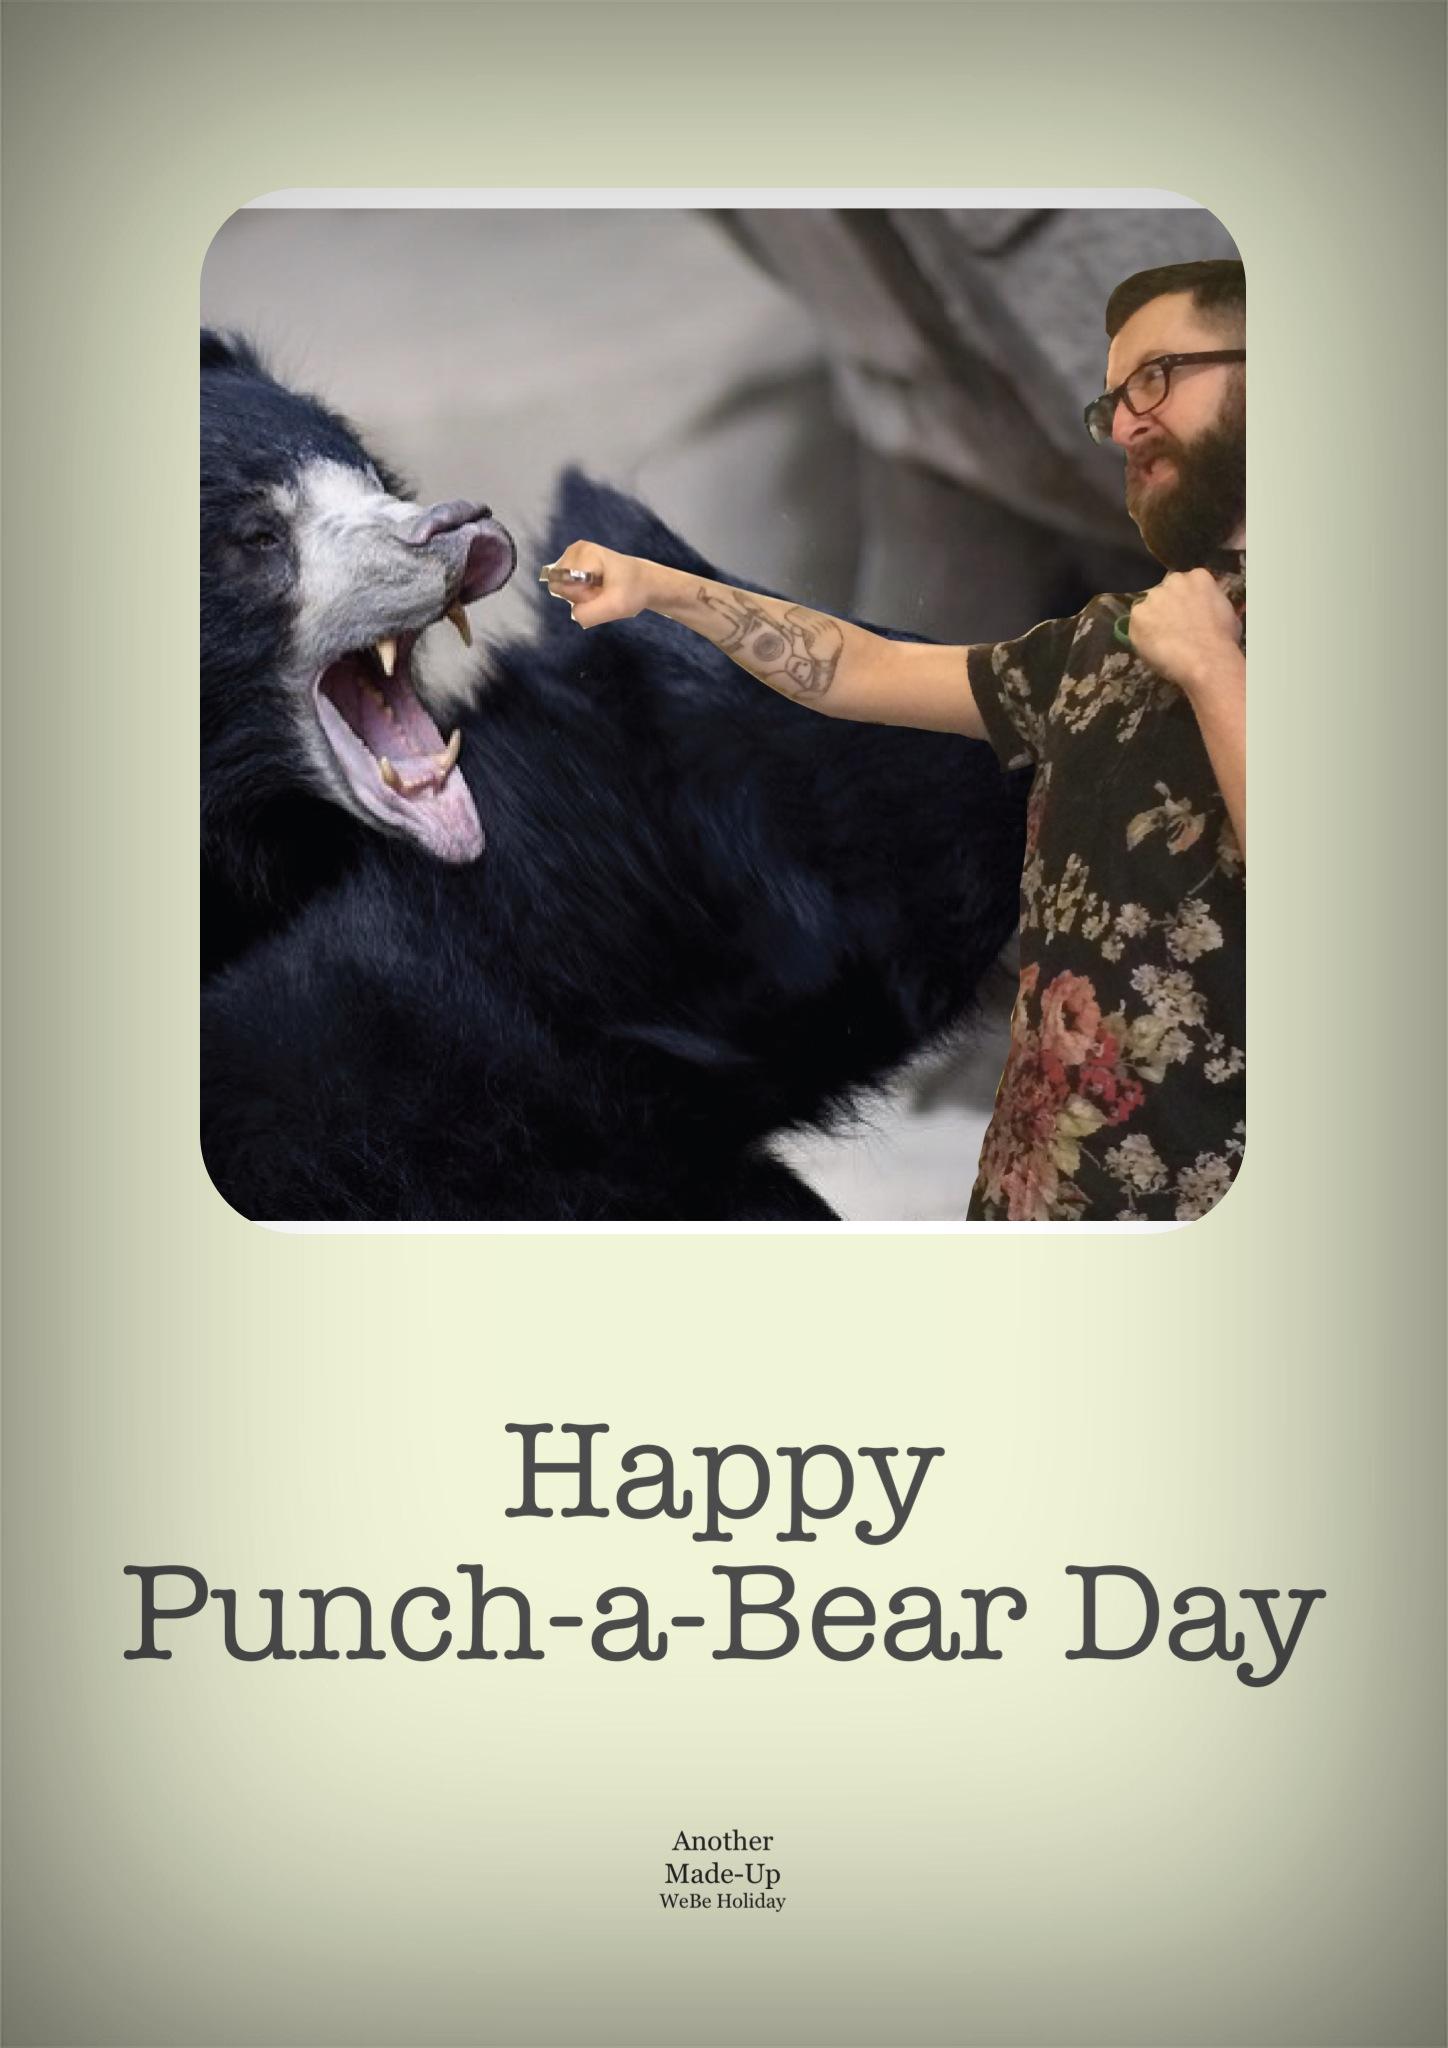 Punch-a-Bear Day 2013 - Tristan.jpg